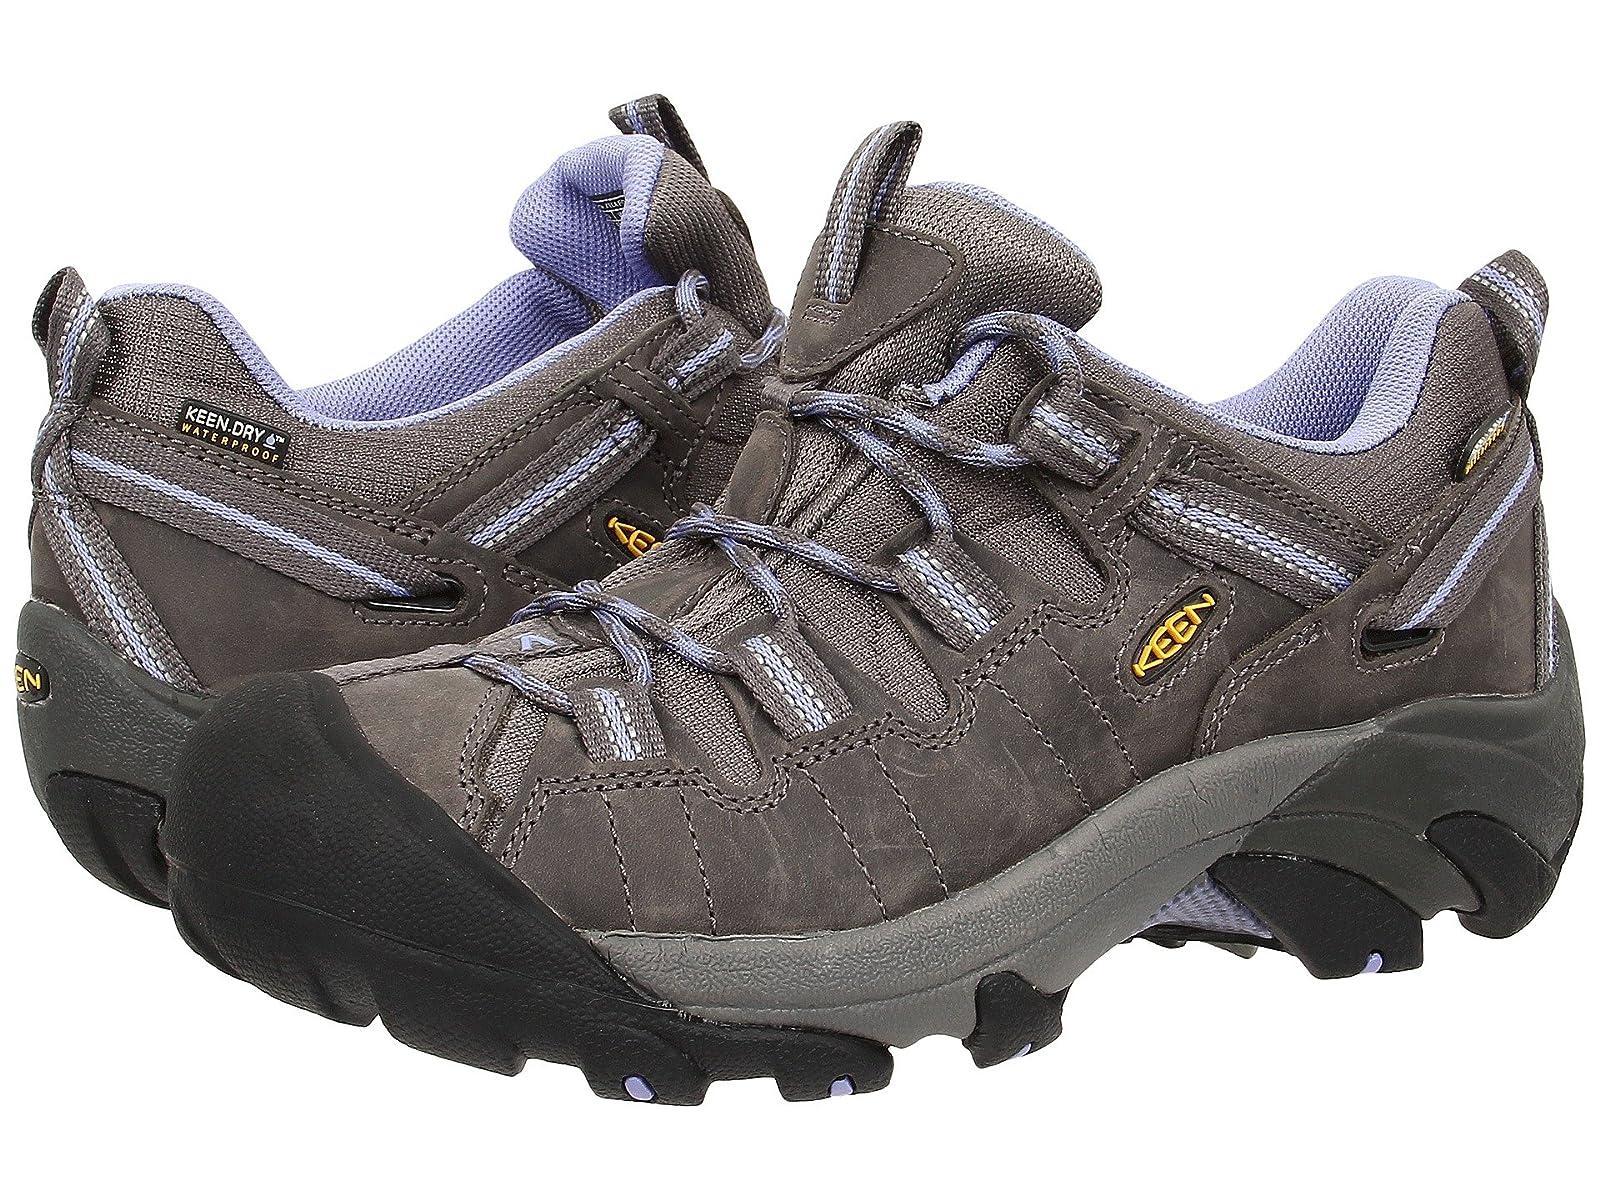 Keen Targhee IIAtmospheric grades have affordable shoes